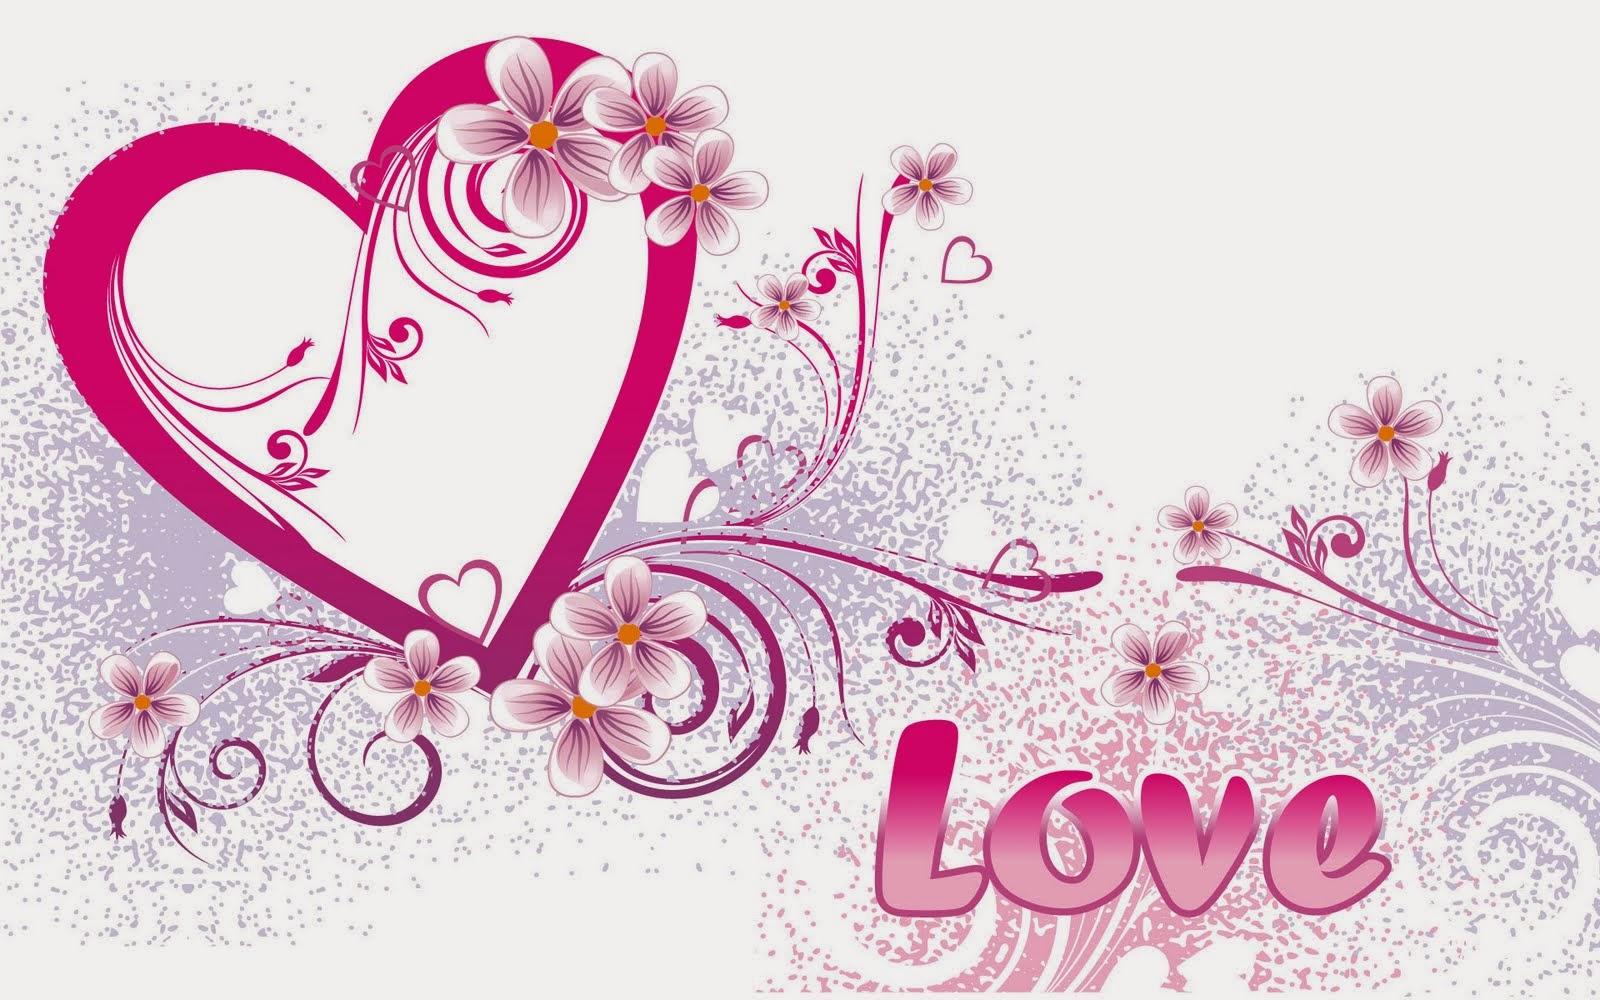 Free live wallpaper love - beautiful desktop wallpapers 2014